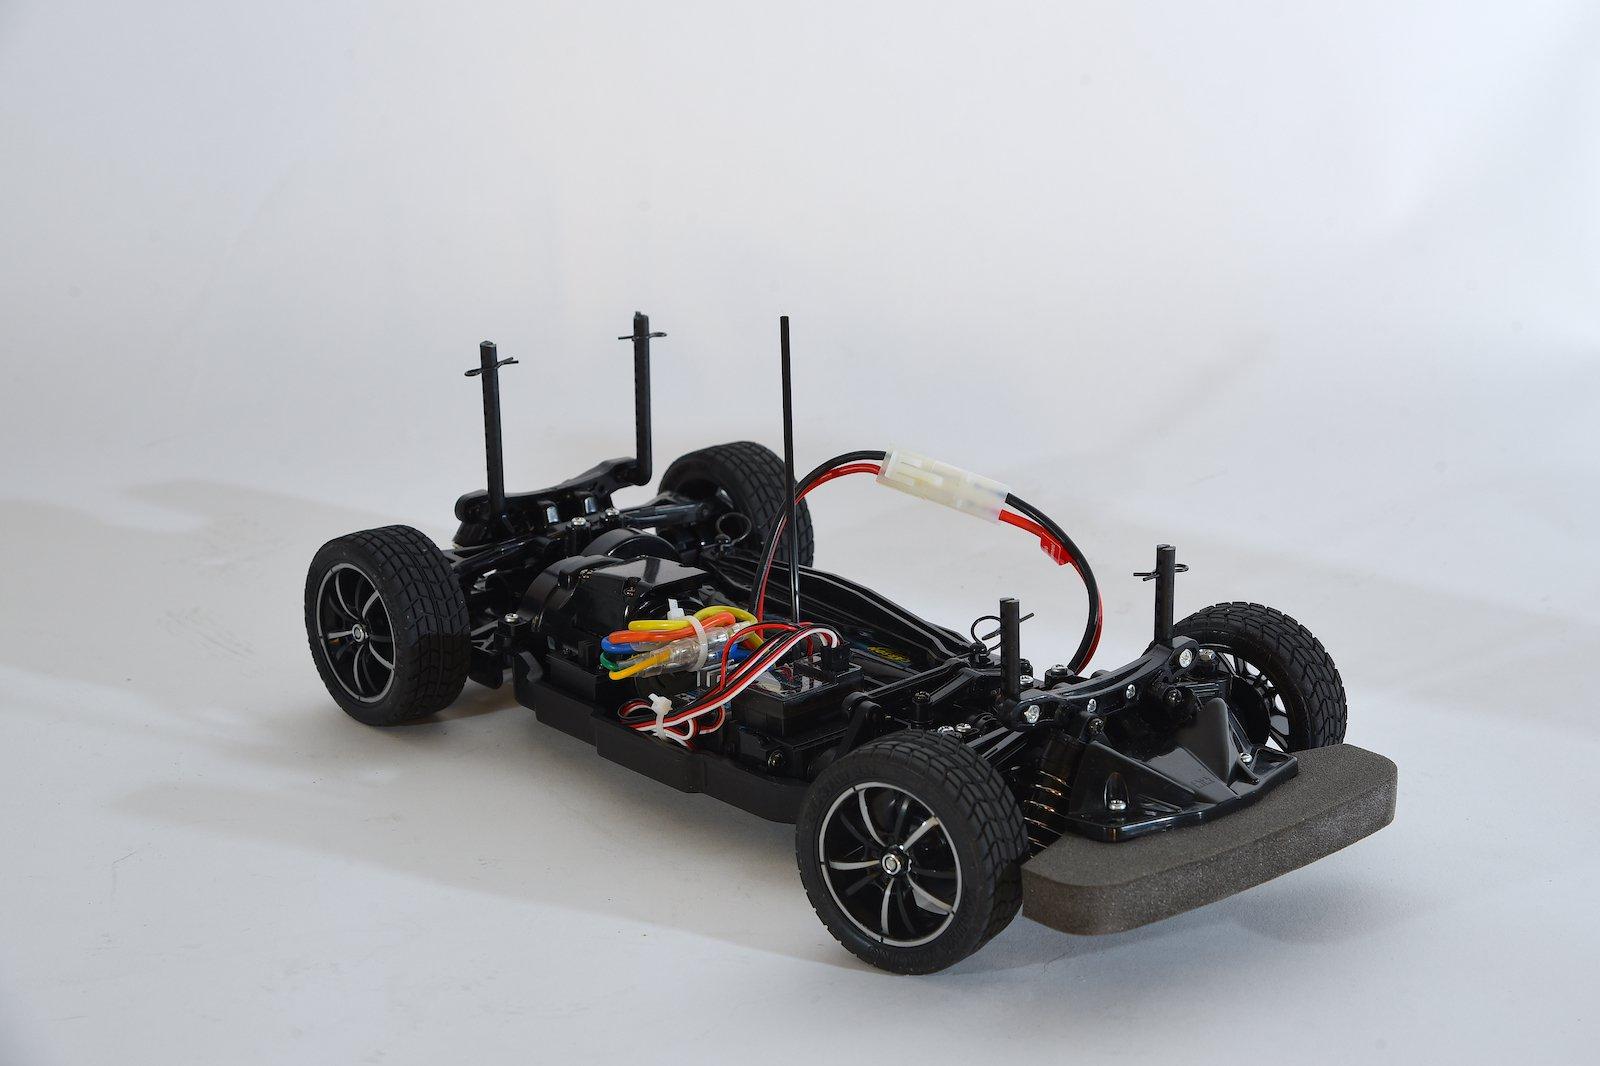 Tamiya Supra chassis